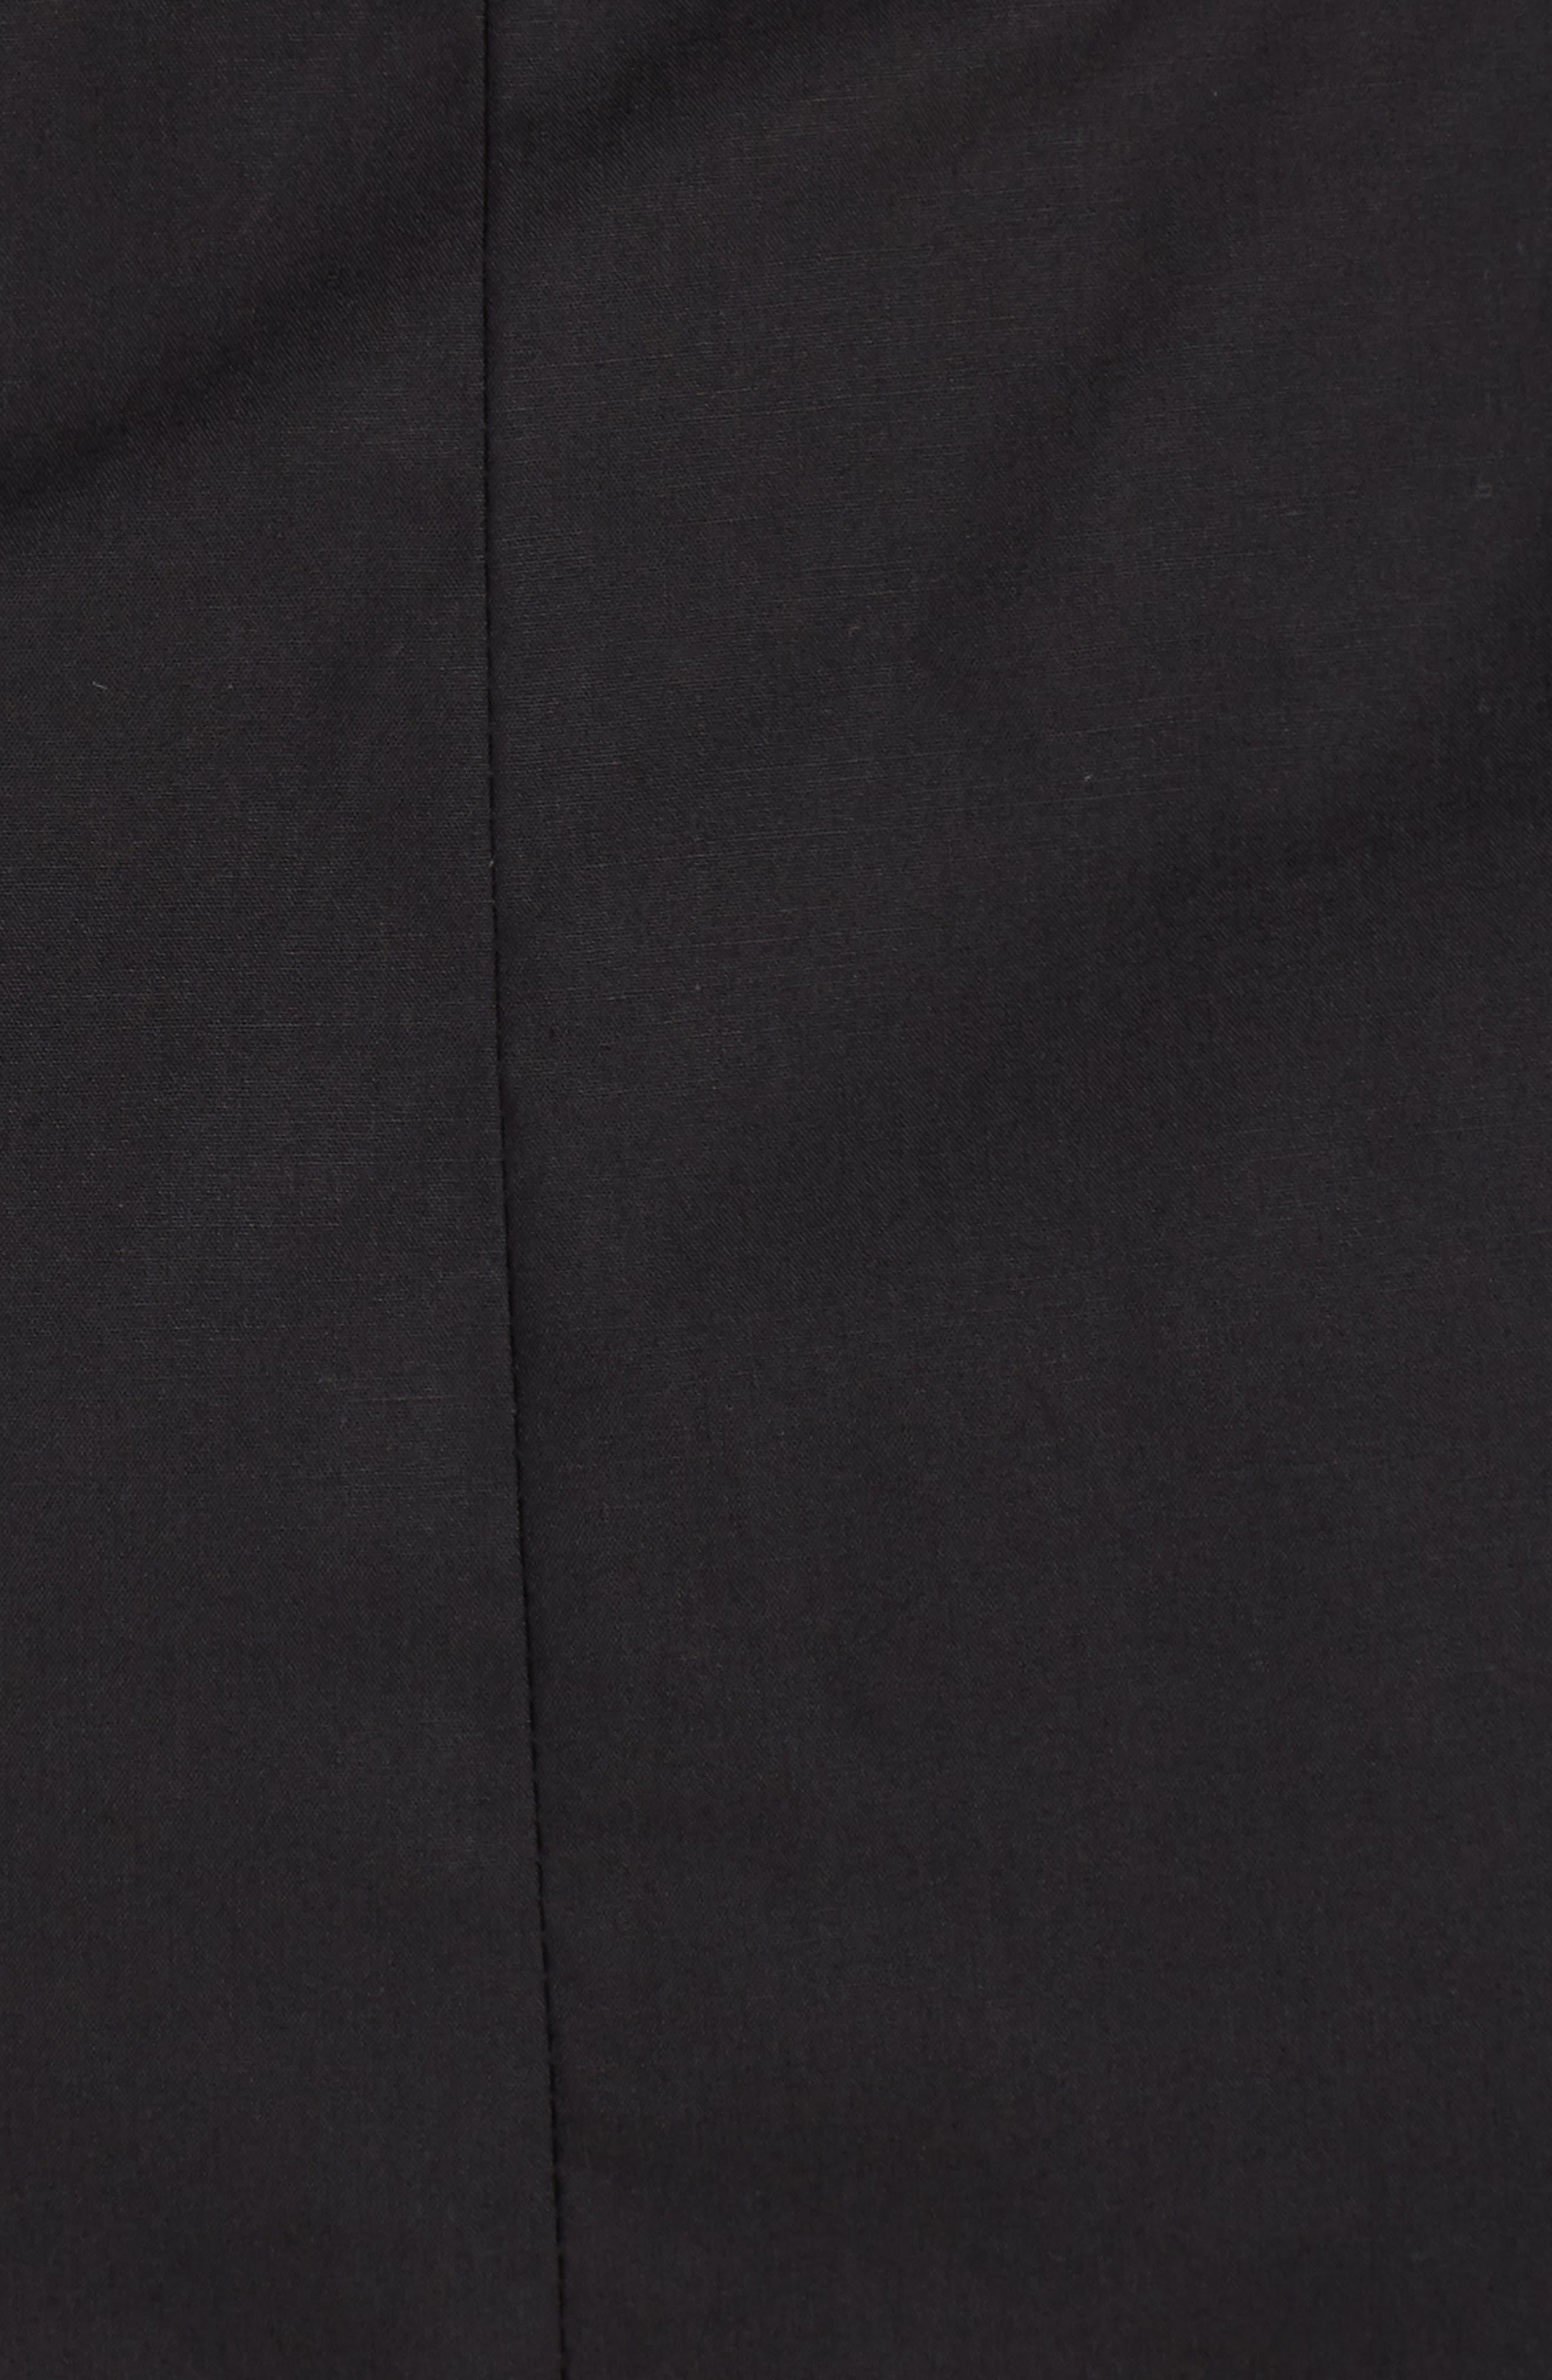 Ultimate Desire Off the Shoulder Minidress,                             Alternate thumbnail 5, color,                             Black